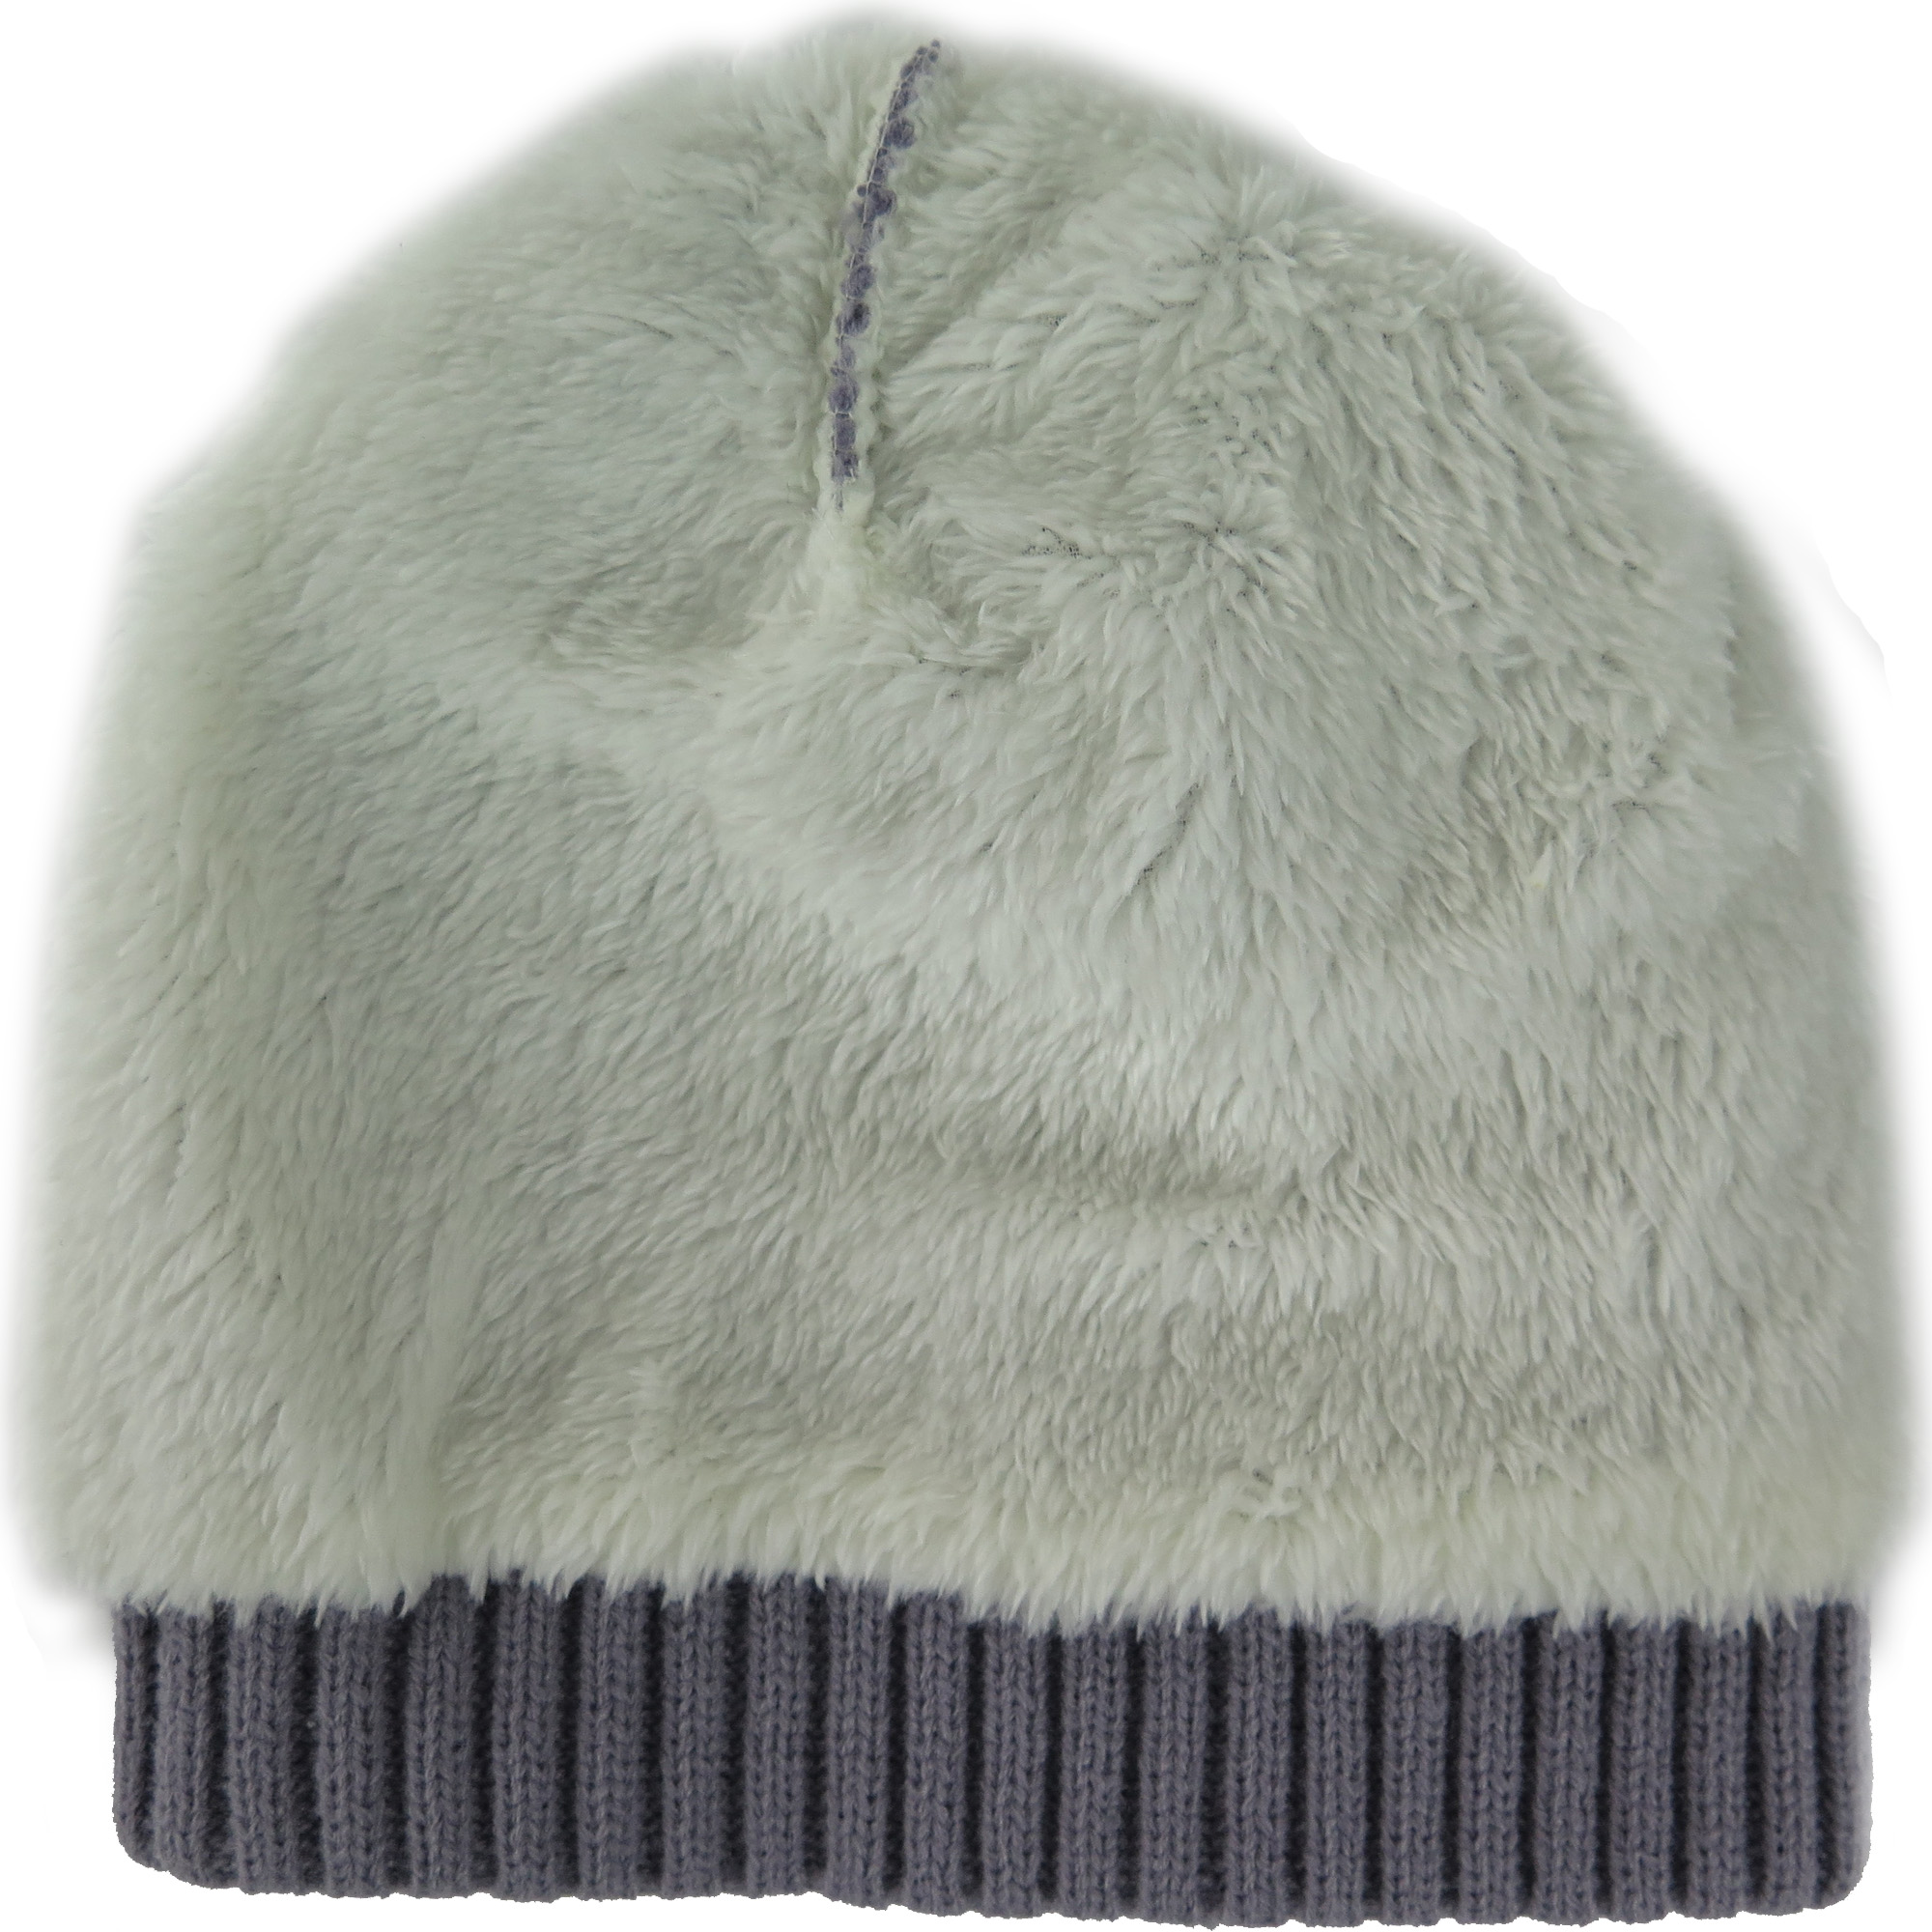 00c601c777cb2 DEBRA WEITZNER - Mens Slouchy Beanie Wool Knit Winter Hat Skull Cap With Fur  Lining Navy By Debra Weitzner - Walmart.com